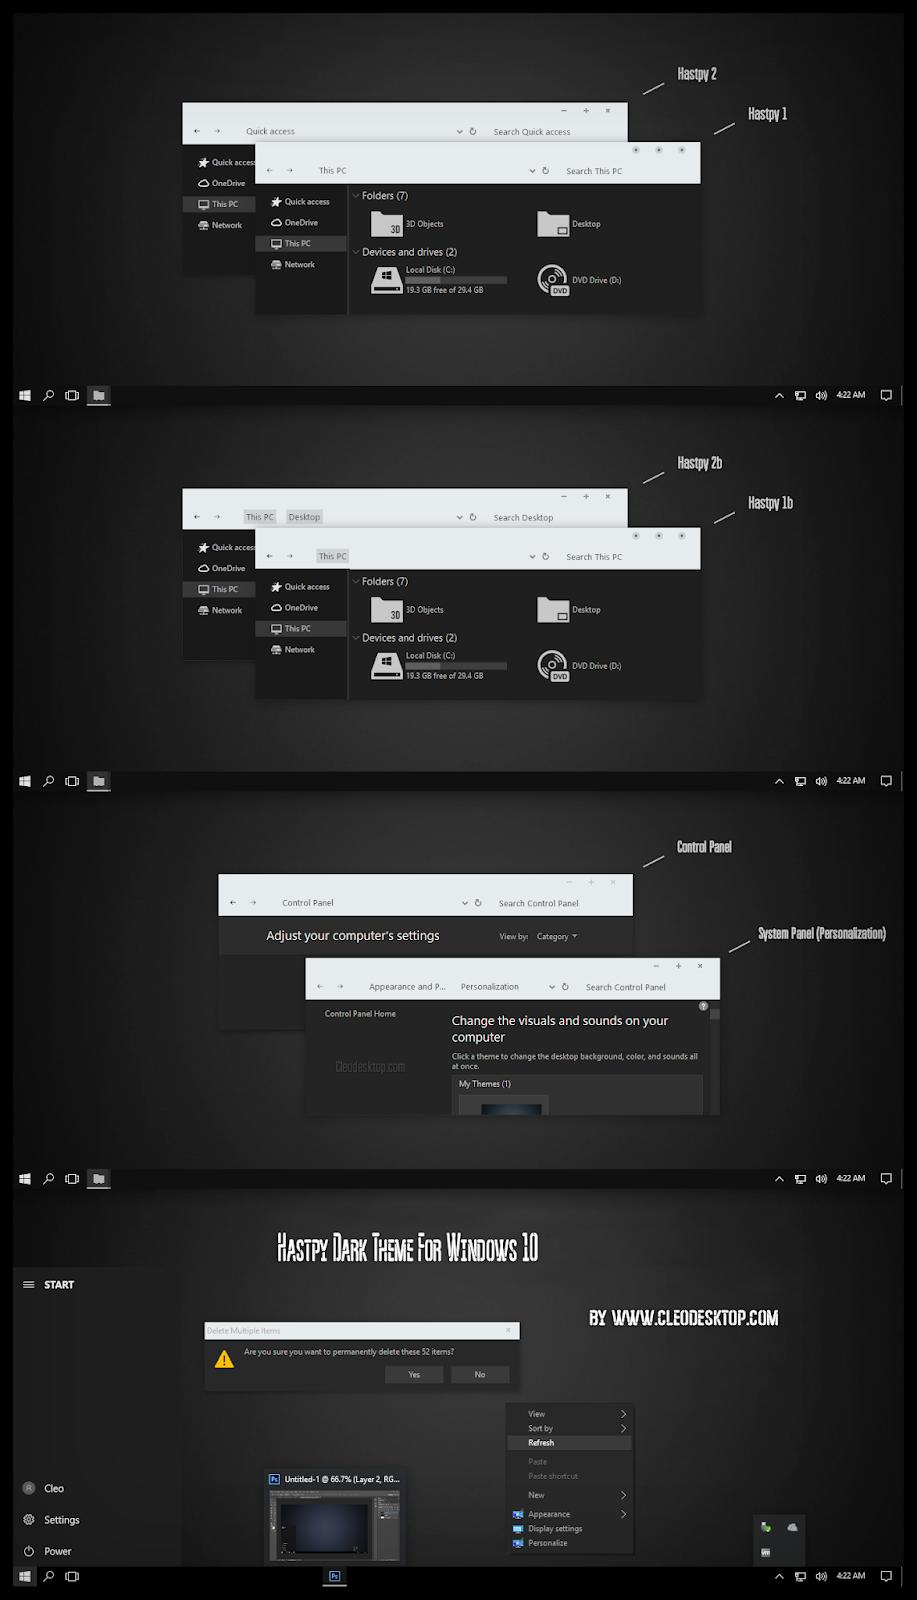 Hastpy Dark White Theme Windows10 November 2019 Update